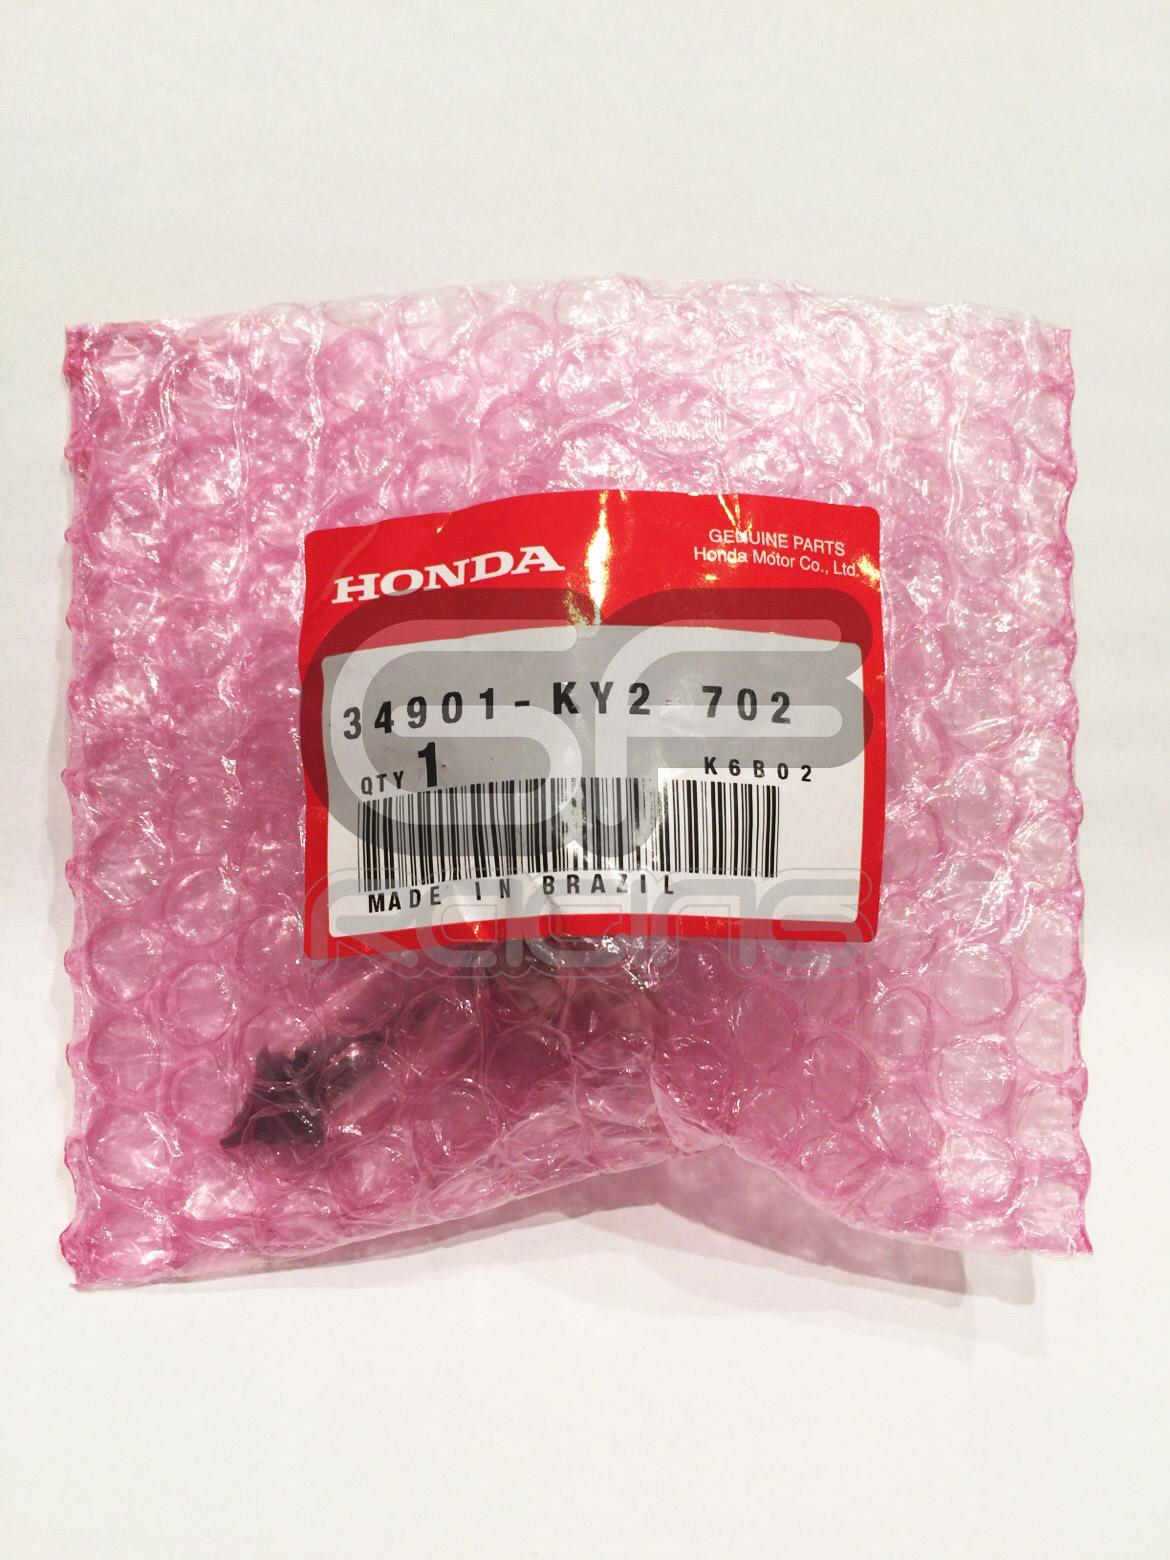 Genuine Honda Part 34901-KY2-702